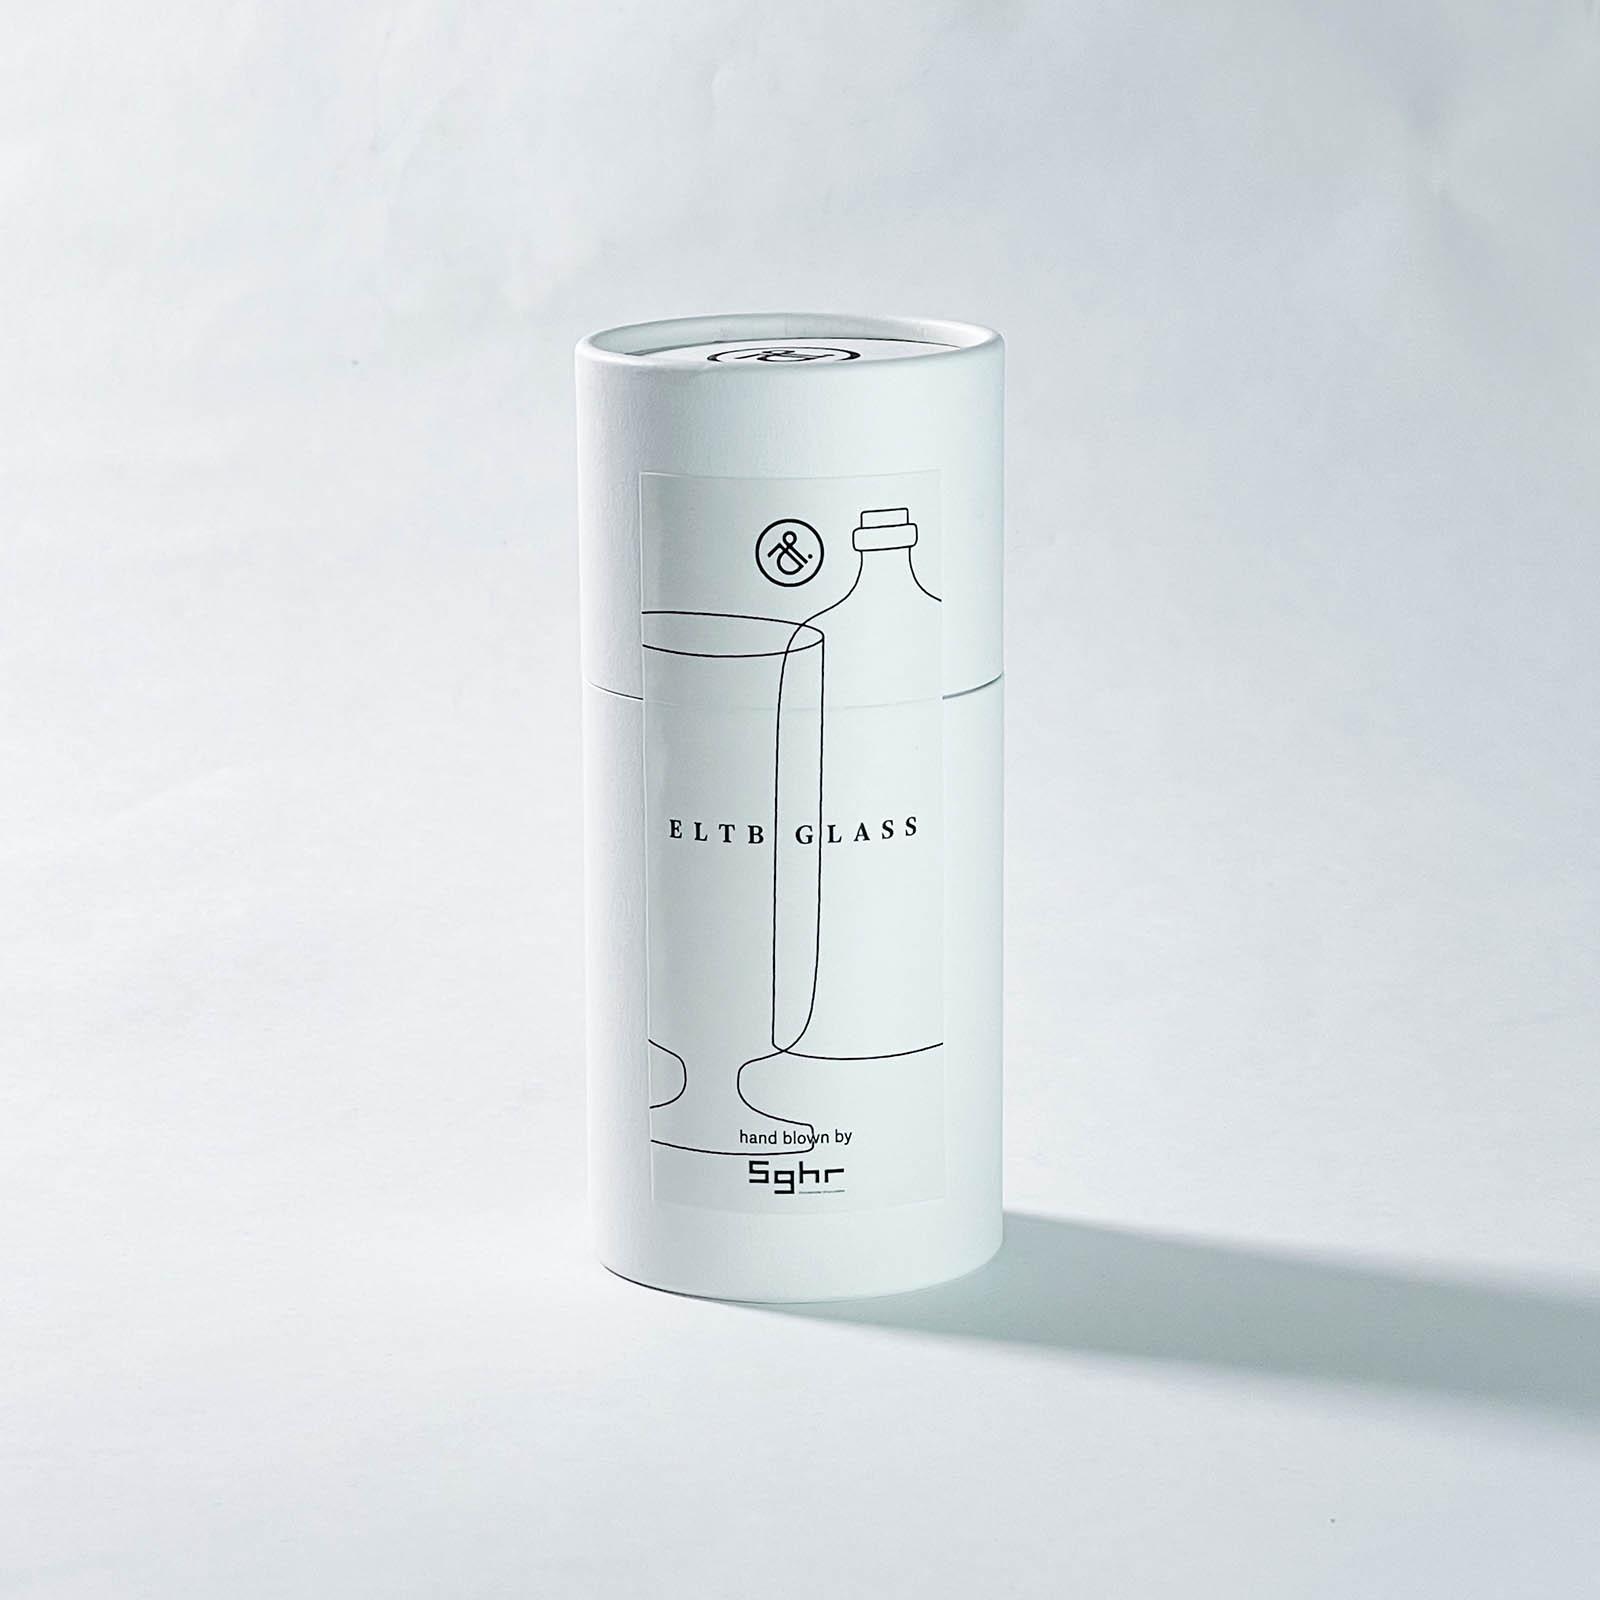 mitosaya × Sghr:蒸留酒 CHOC&APPLE 1本+ELTB GLASS 1客 セット GIFT